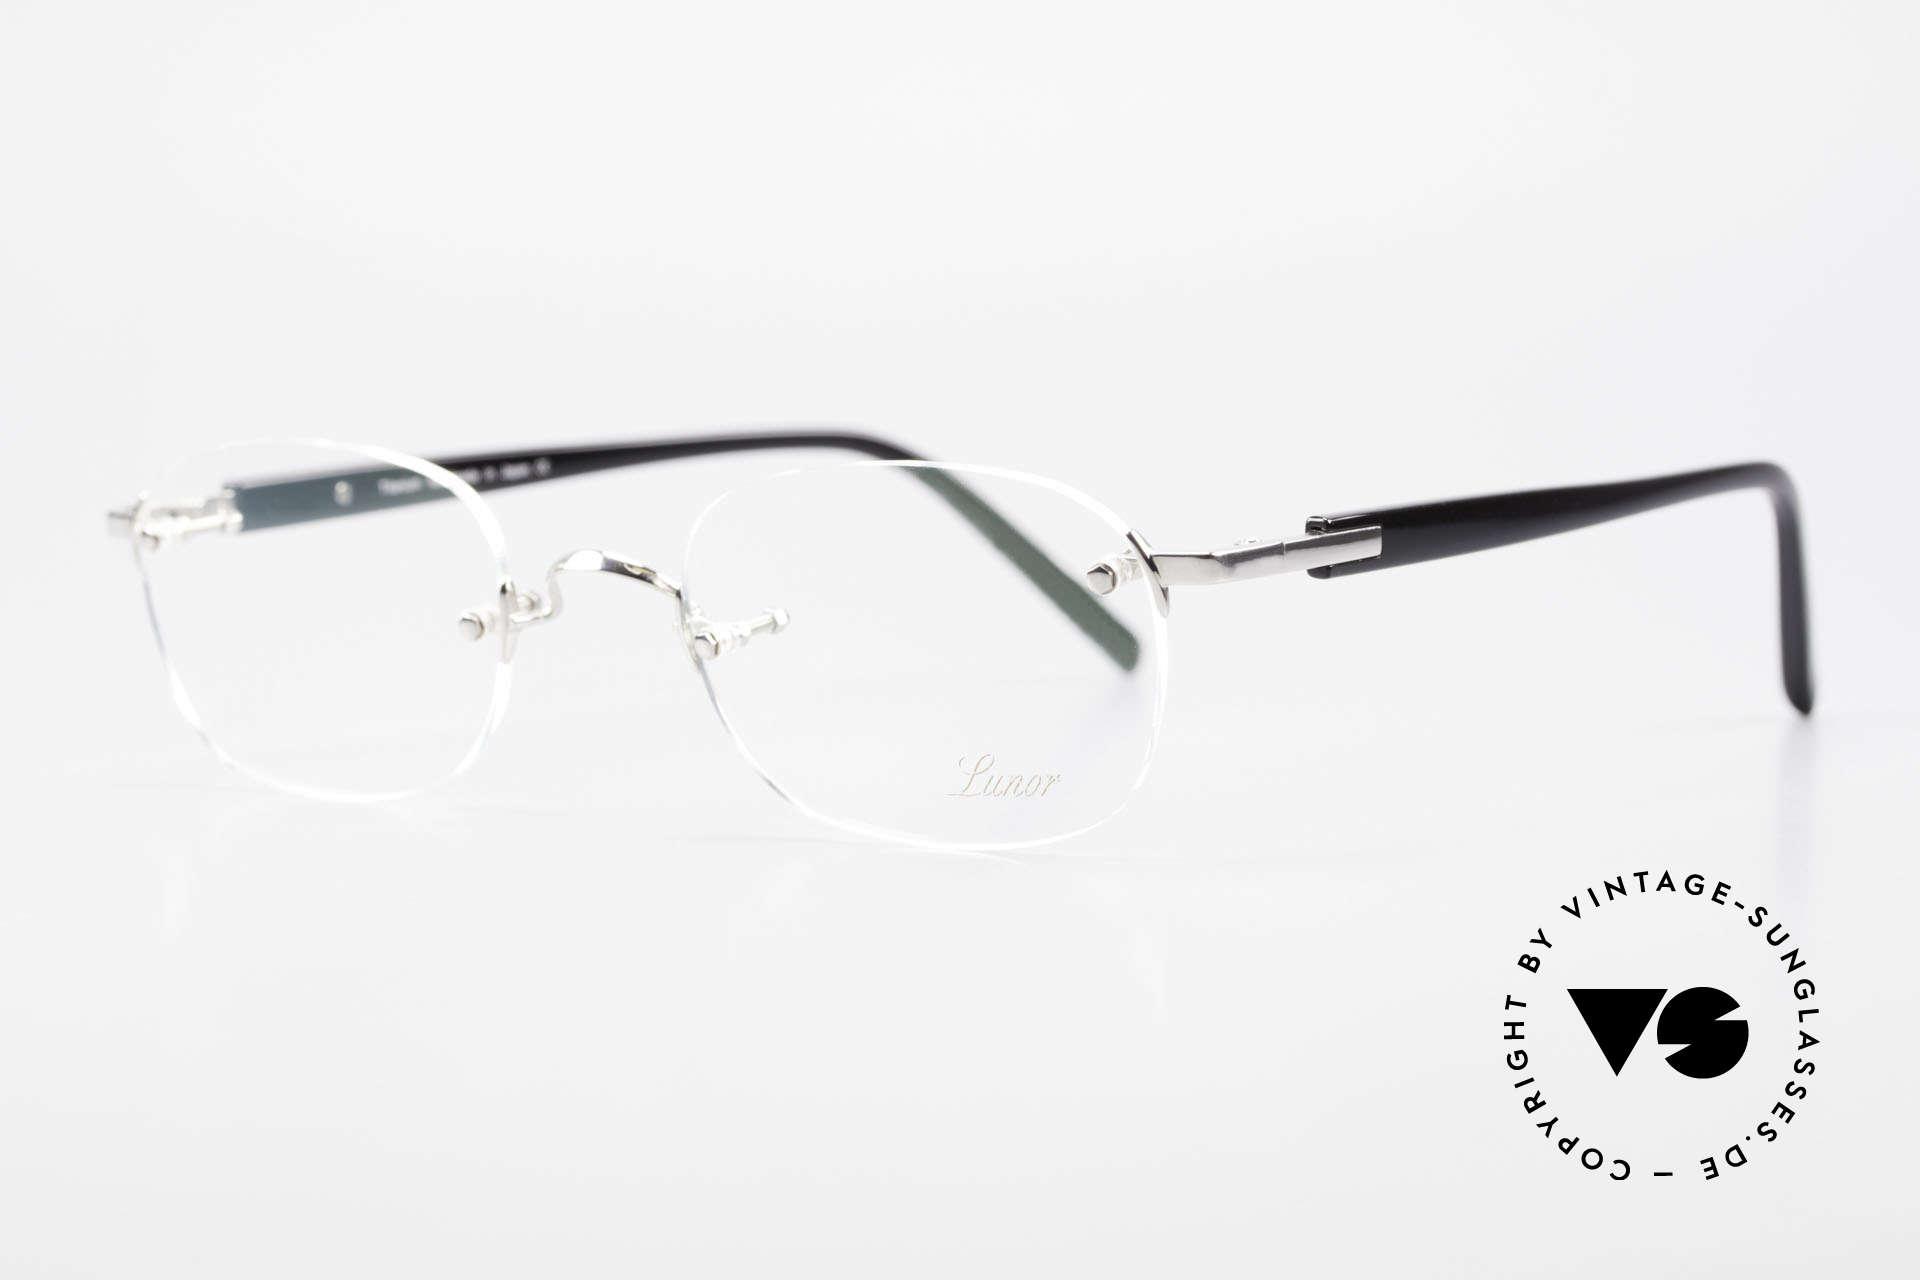 "Lunor Classic V Anatomic PP Rimless Frame Platin Plated, rimless model ""Classic Anatomic"" PLATIN-plated 50x23, Made for Men"